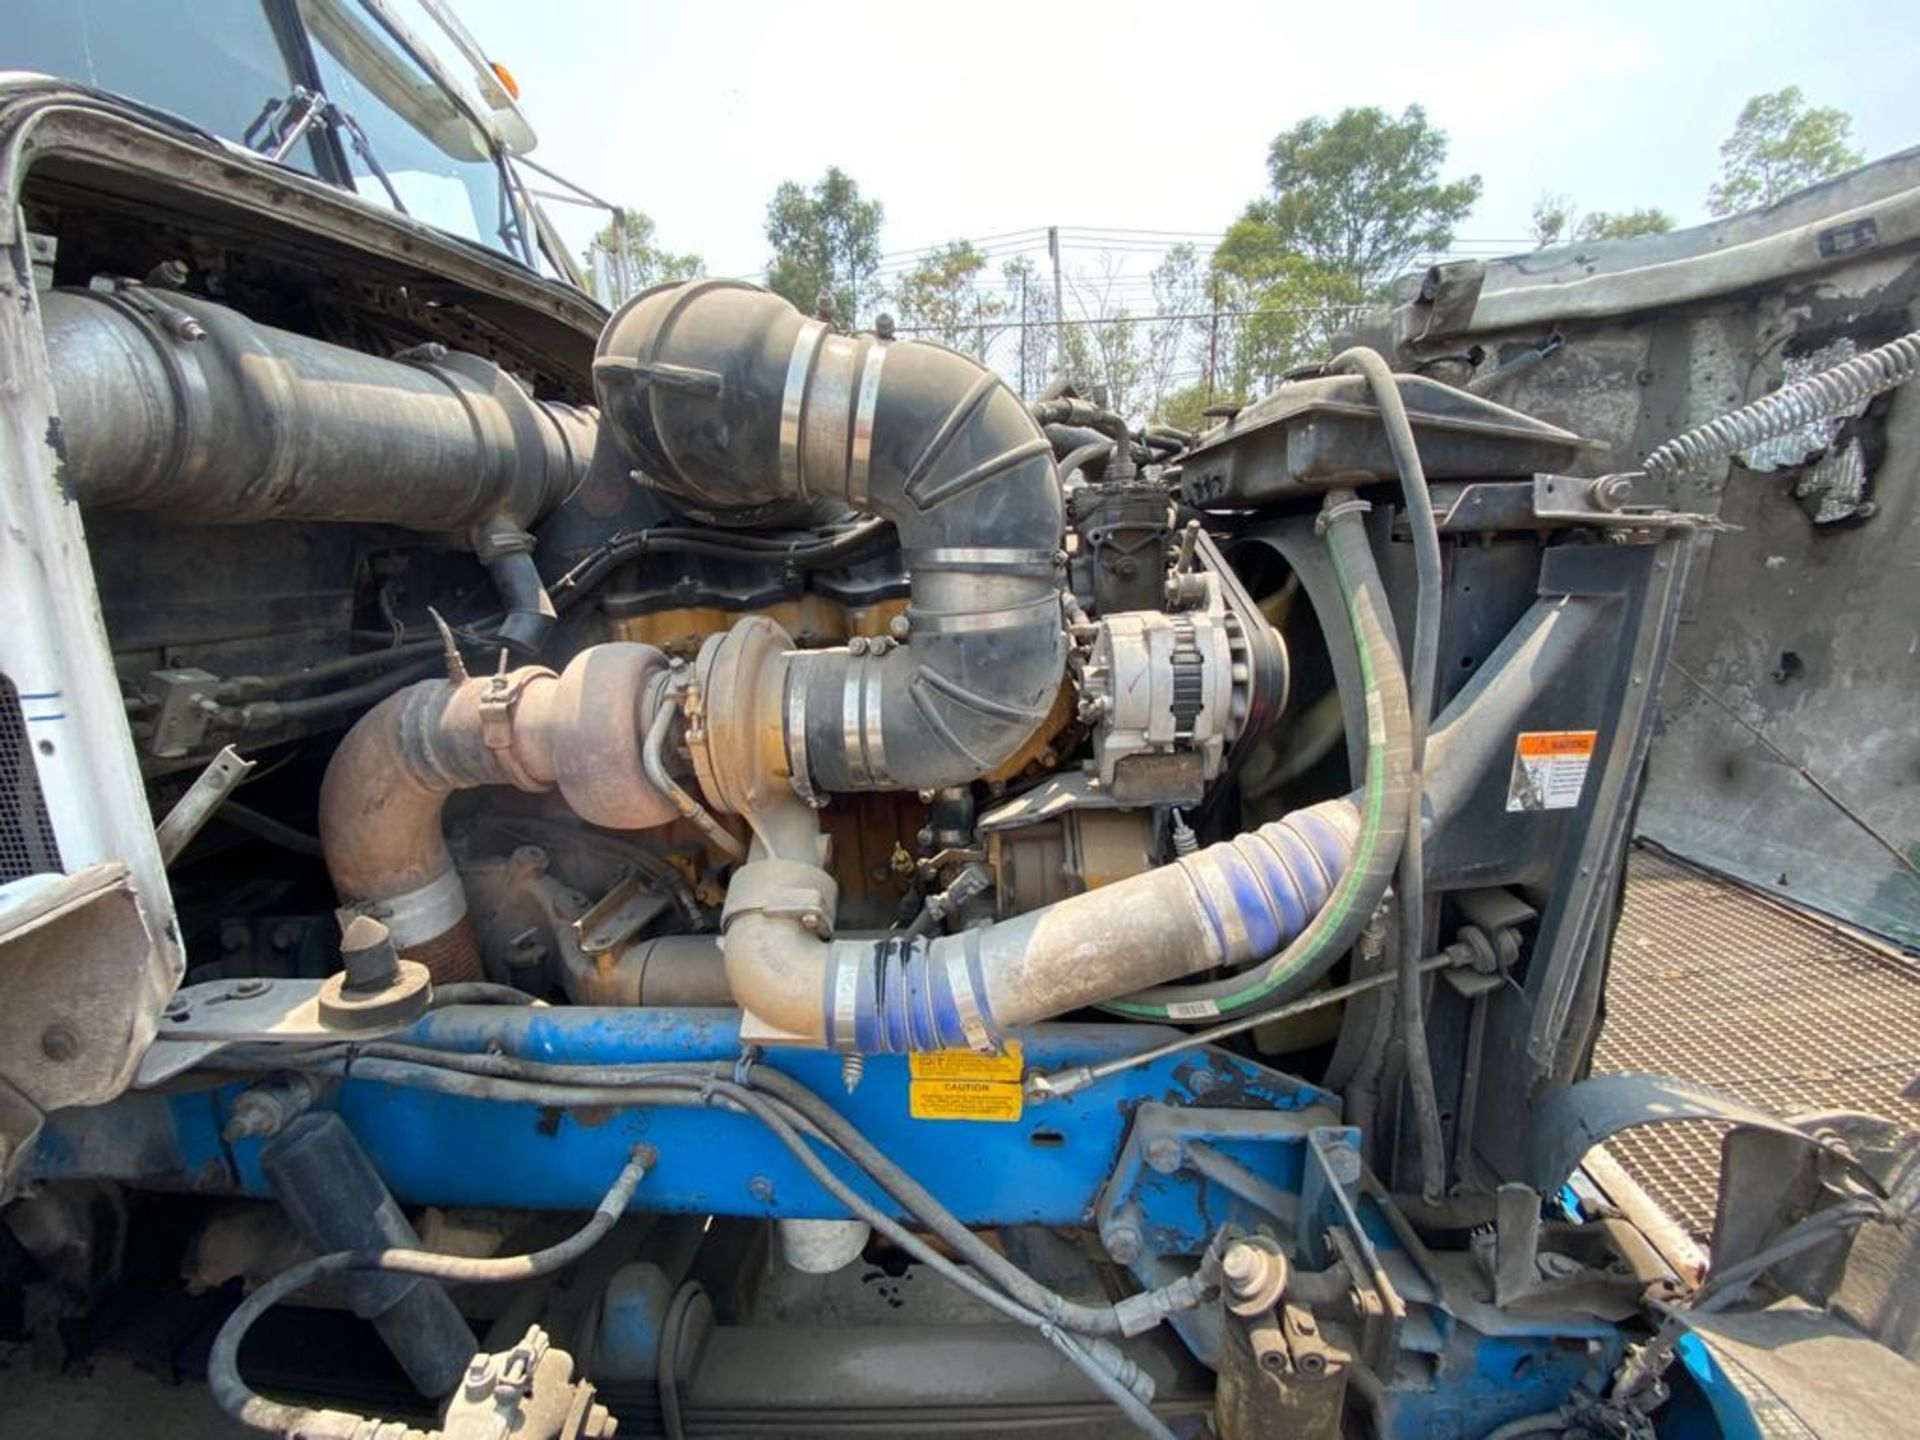 1999 Kenworth Sleeper truck tractor, standard transmission of 18 speeds - Image 62 of 70